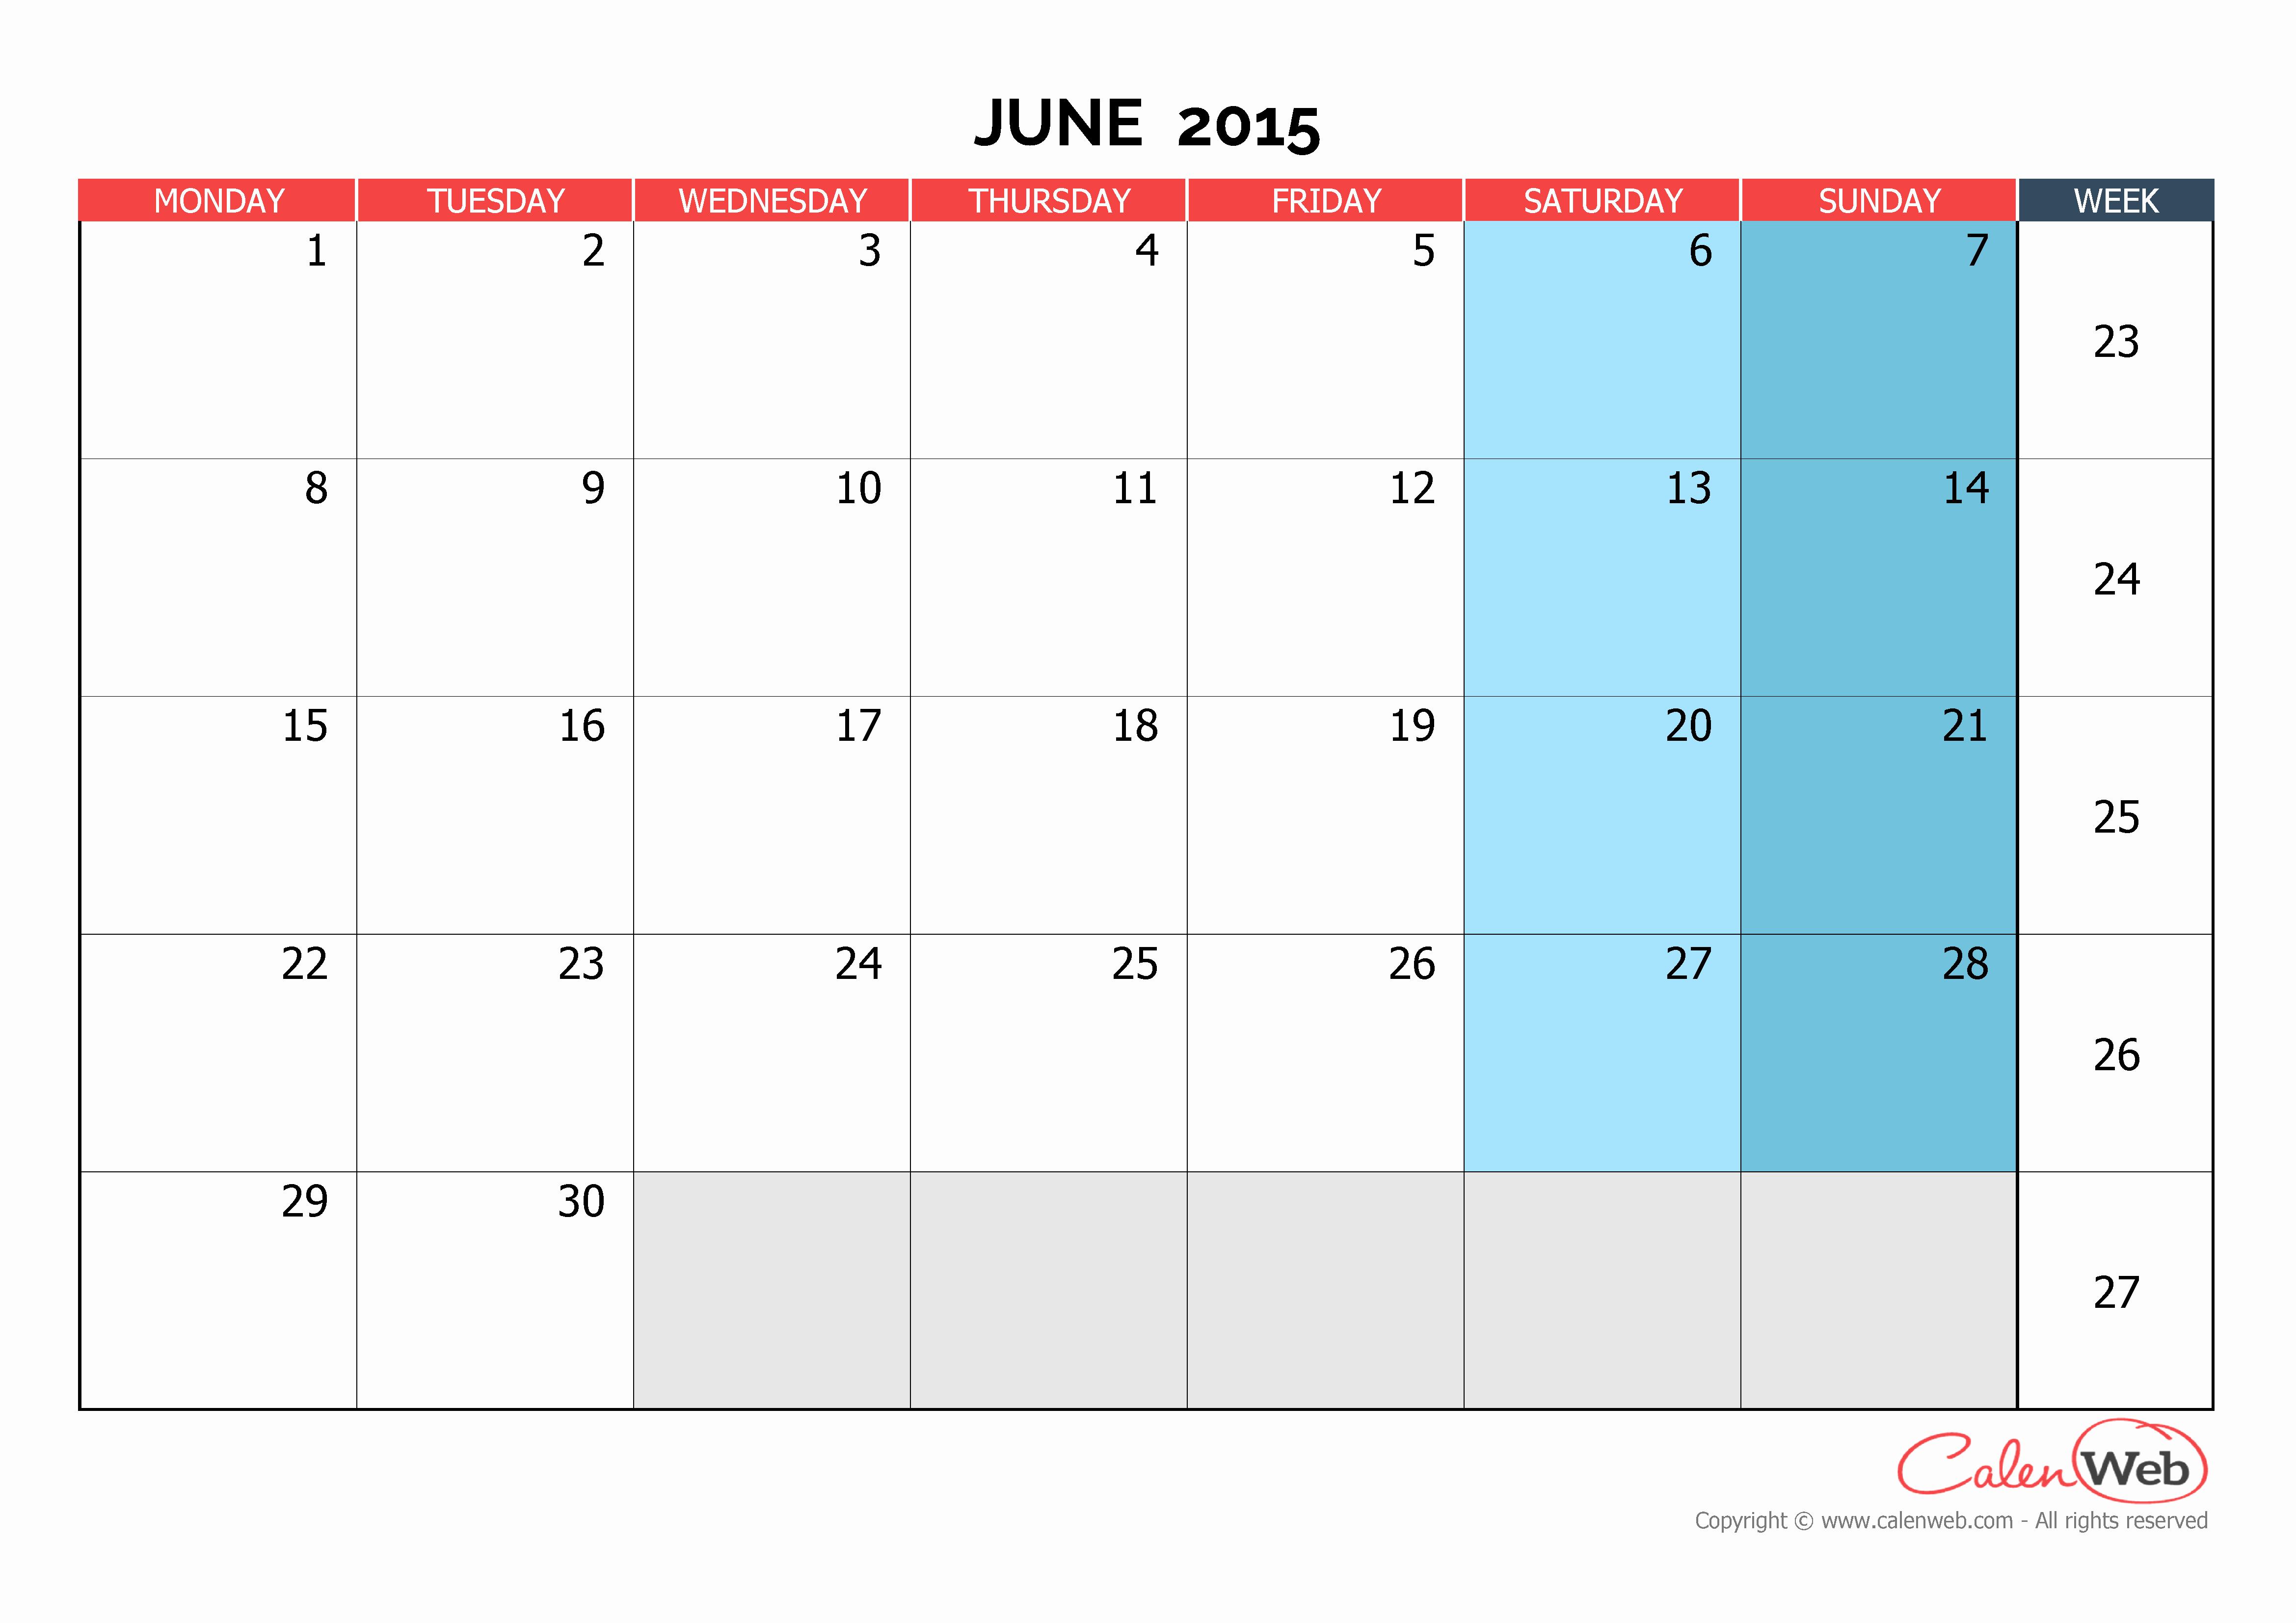 2017 Calendar Month by Month Inspirational Month Calendar – 2017 Printable Calendar